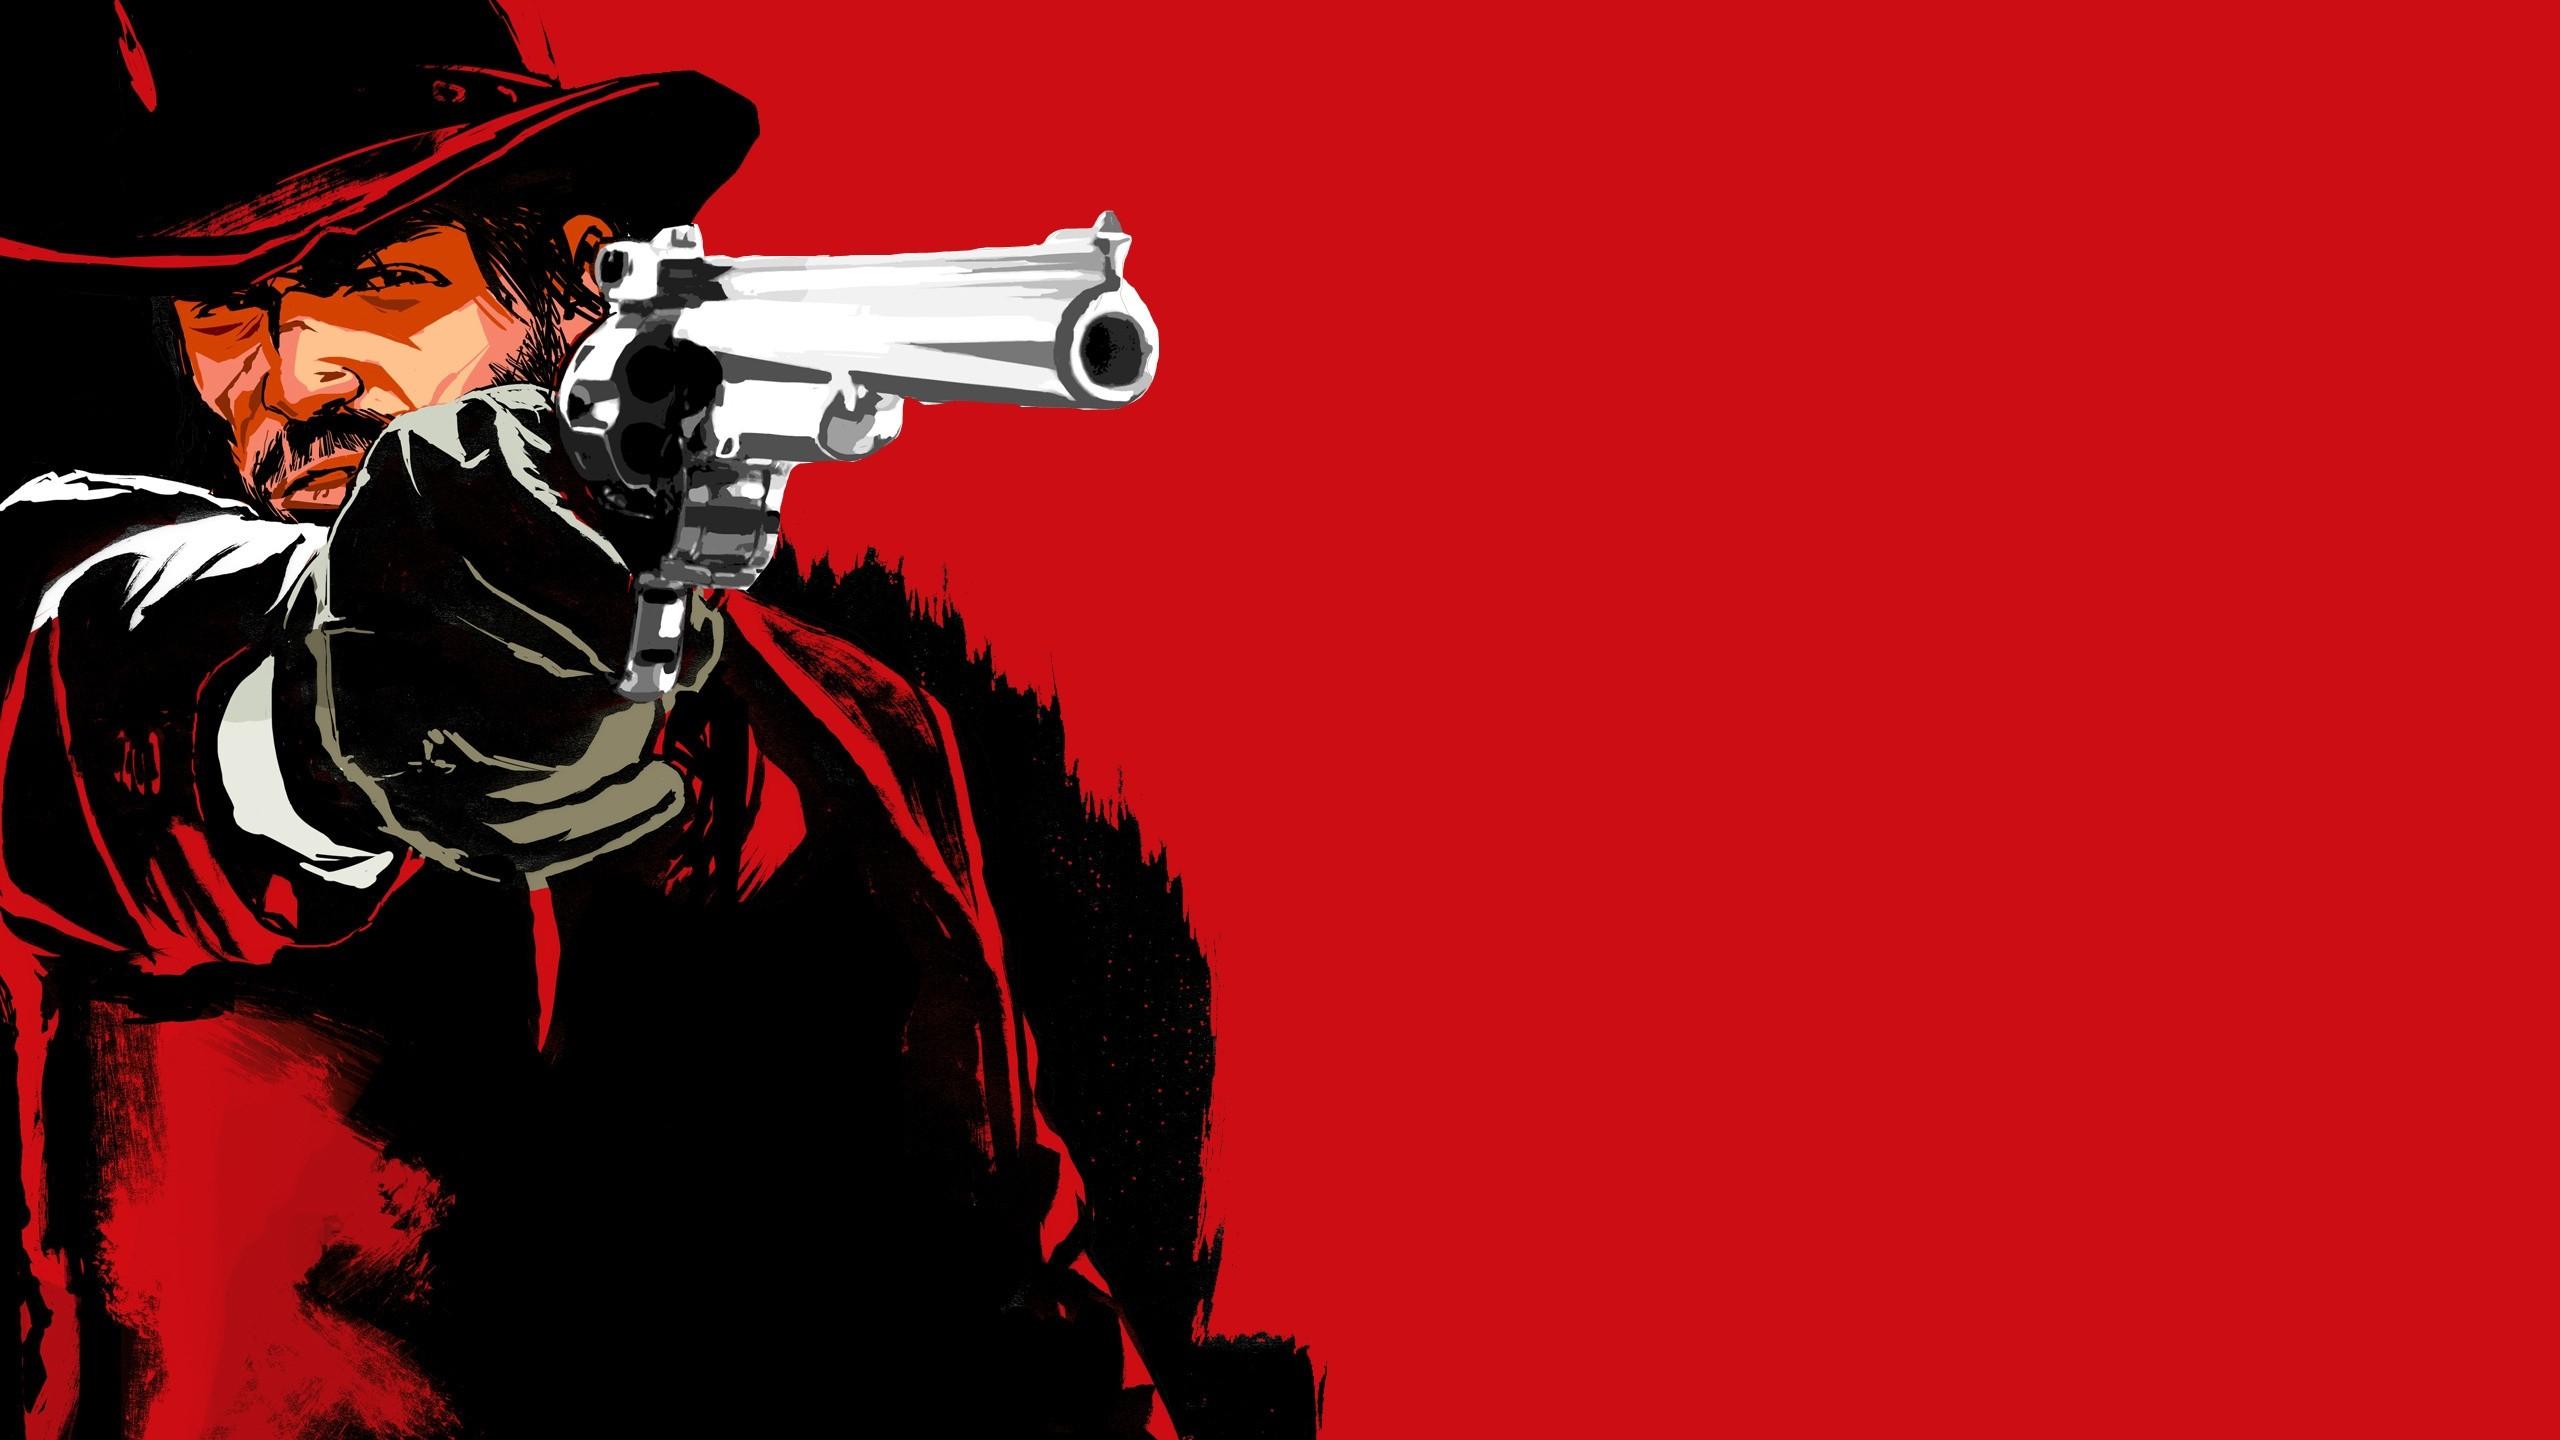 Wallpaper red dead redemption game, pistol, cowboy, hat